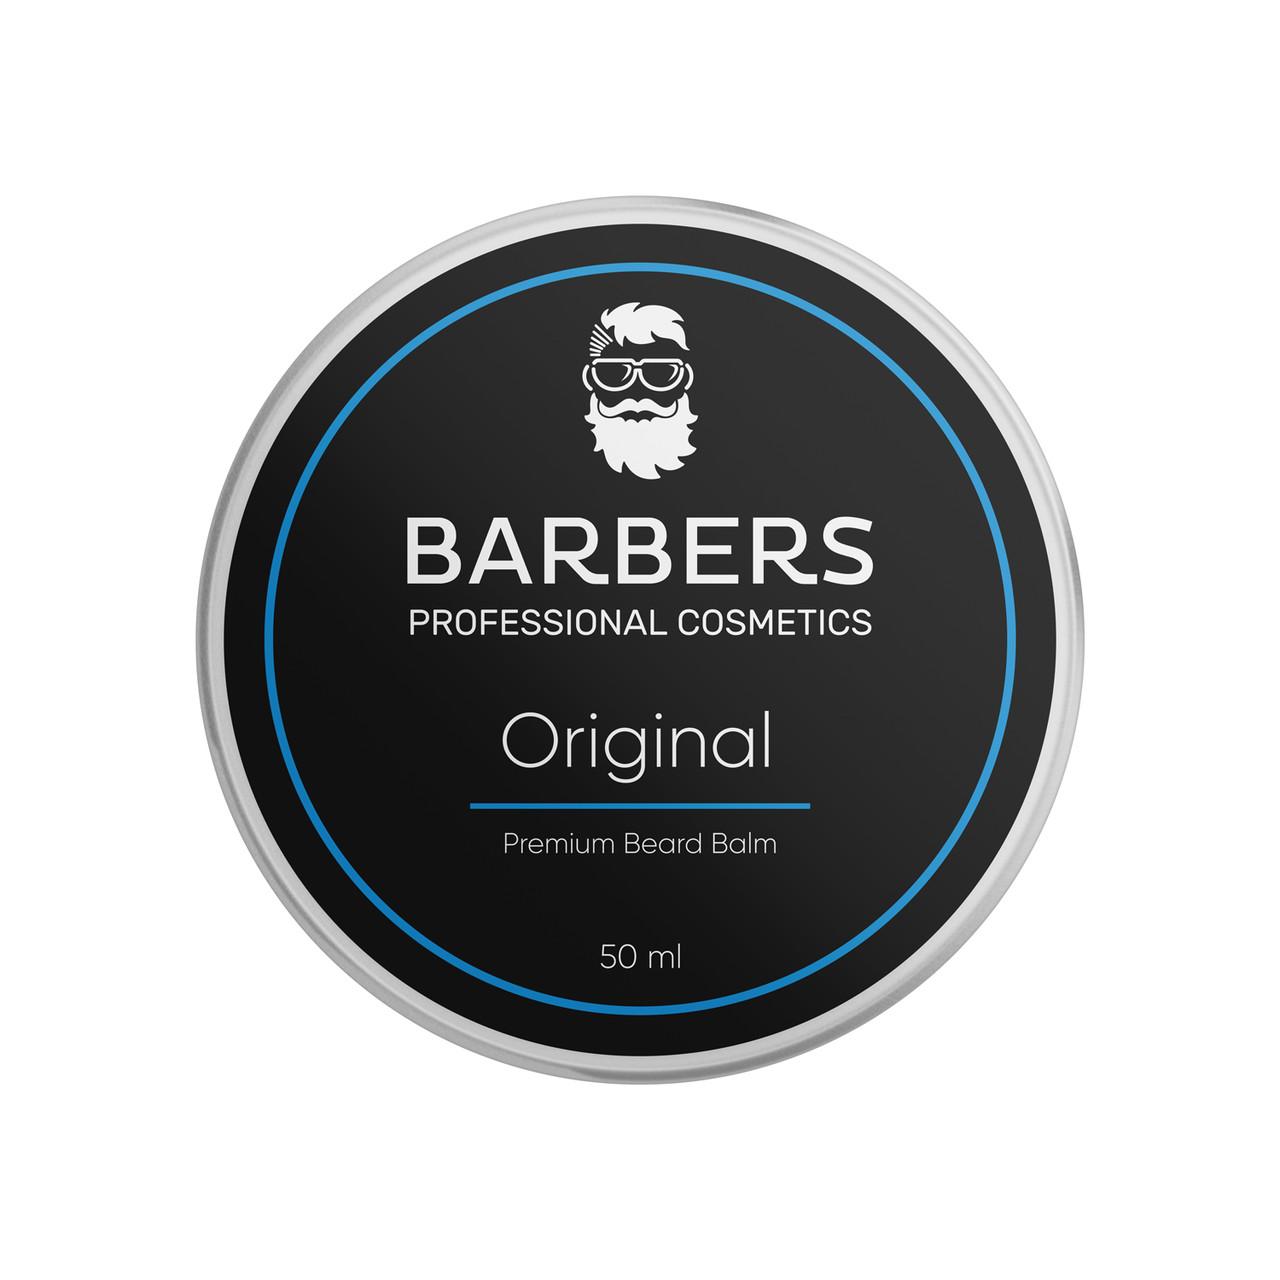 Бальзам для бороды Barbers Original  50 мл